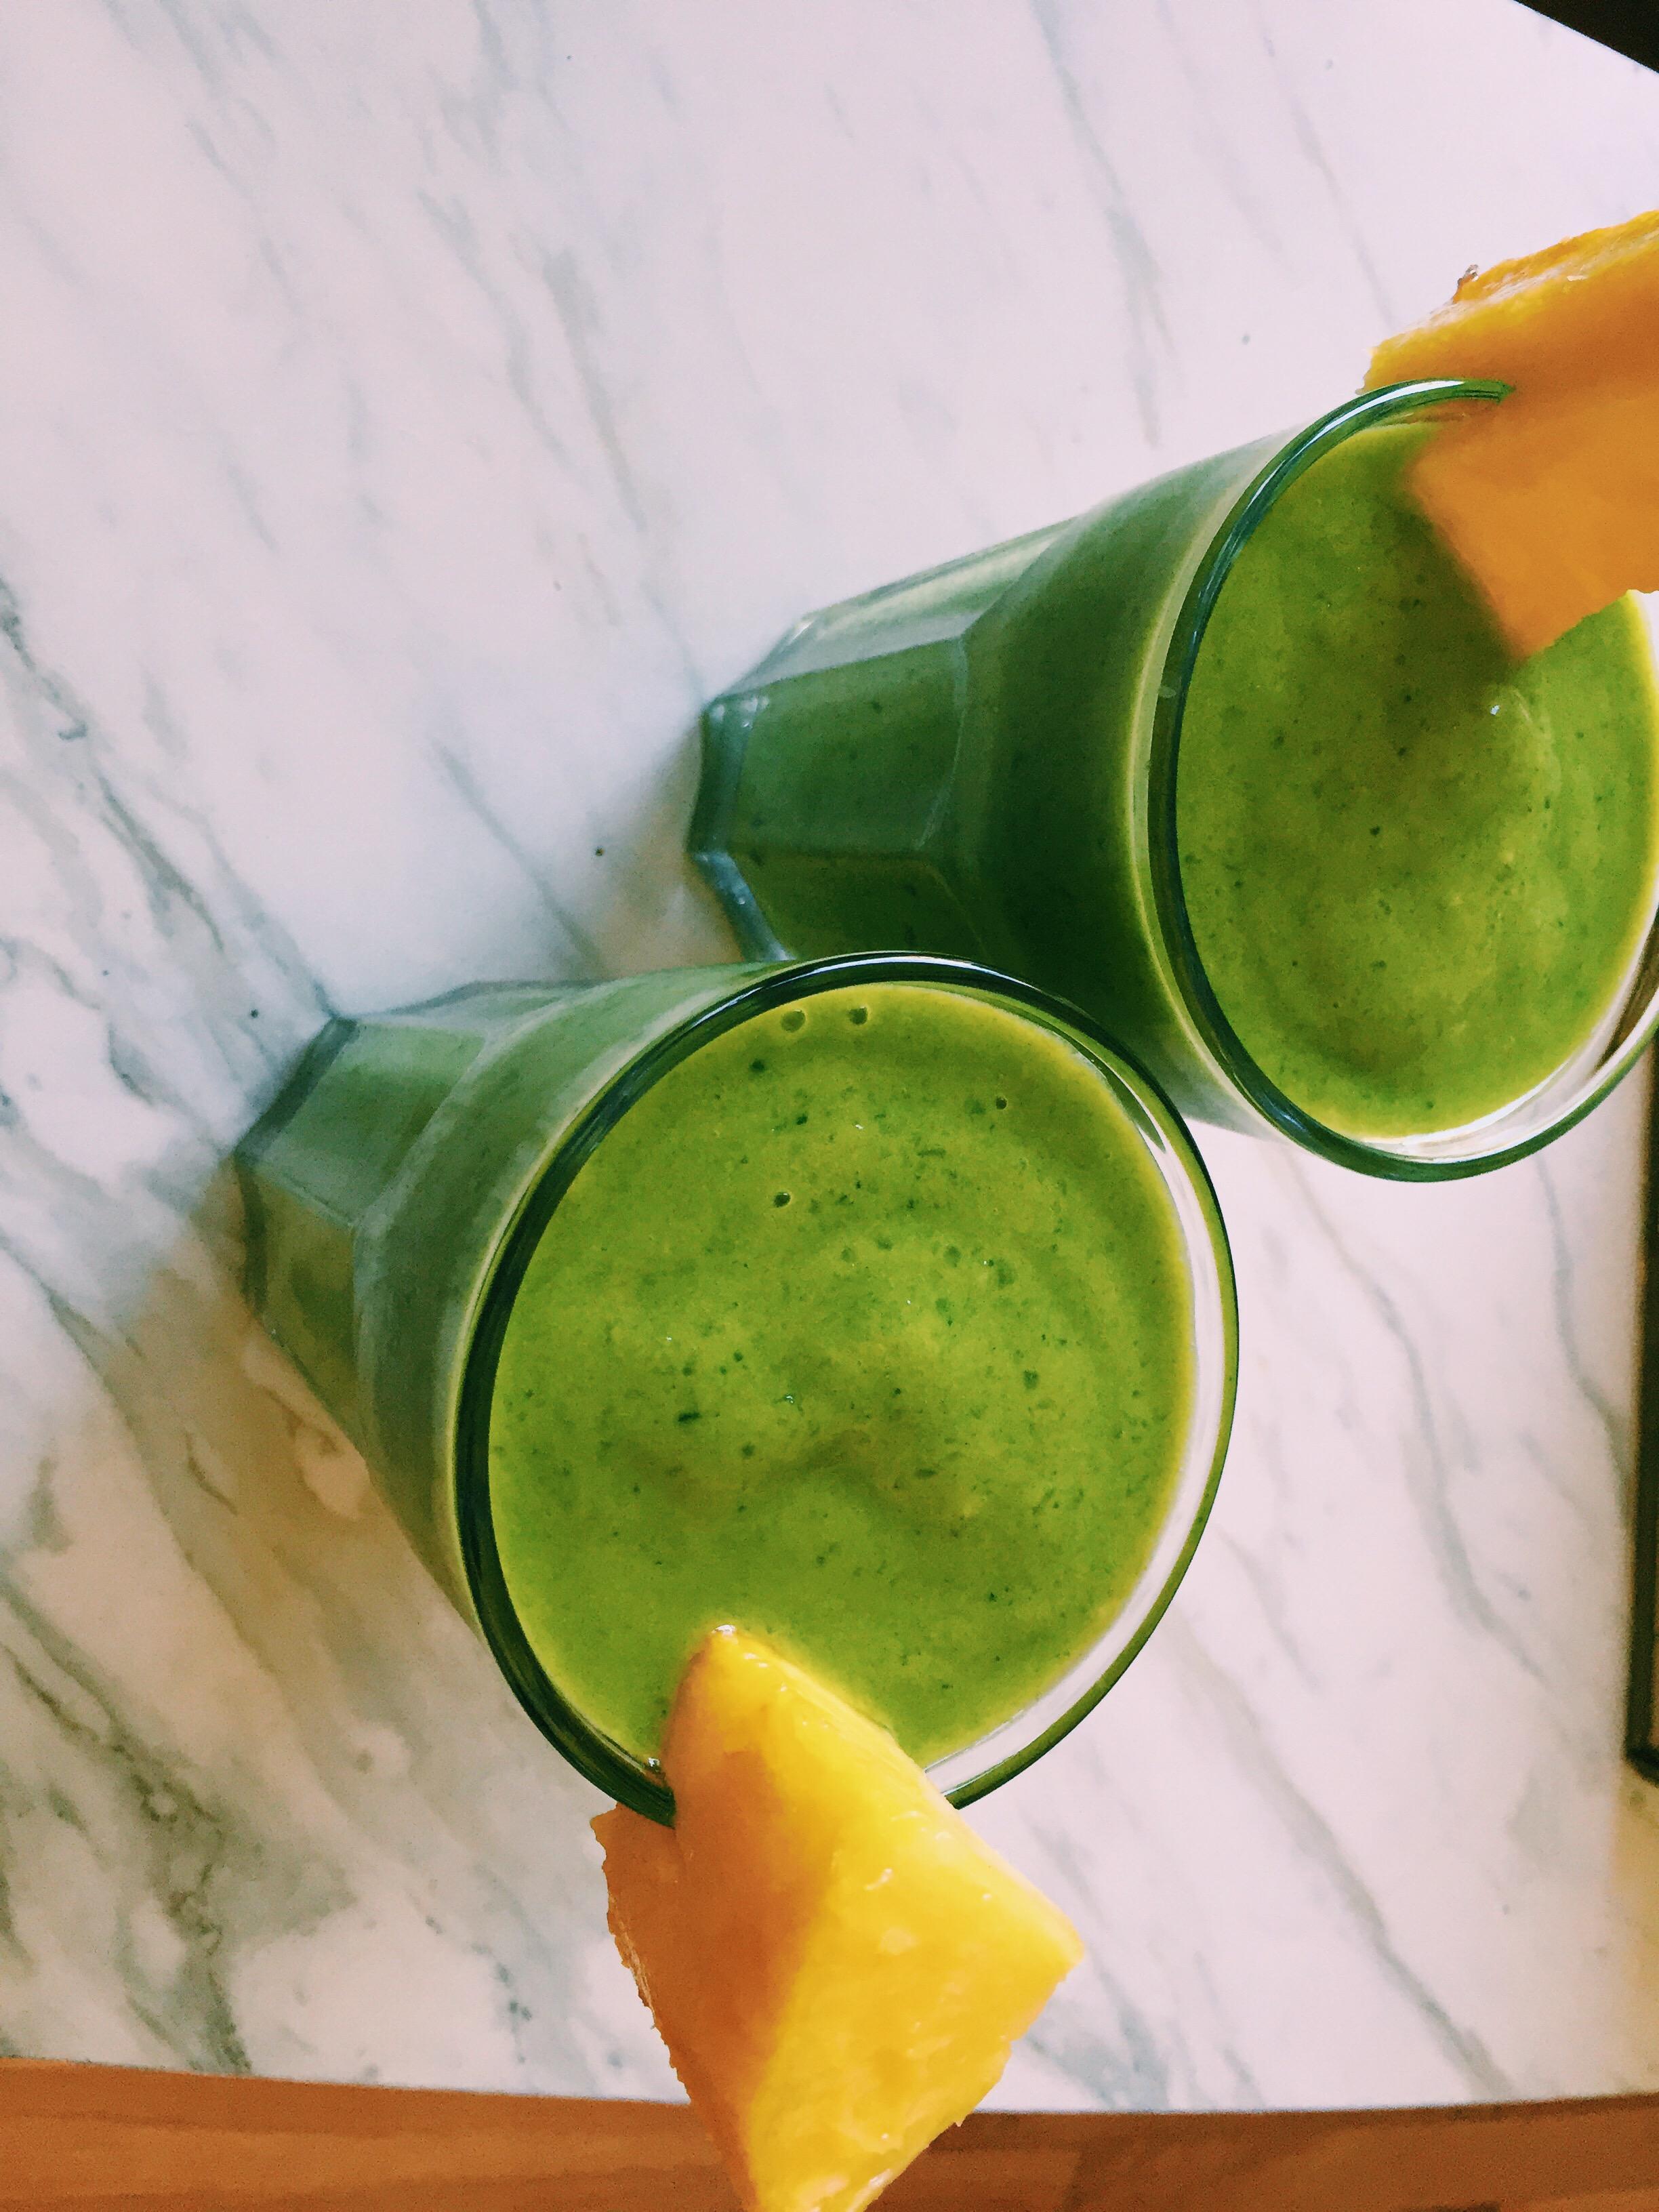 Smoothie: Spinach, pineapple, mango, banana, rice milk, ice. MMMMMMMMMMM!!!